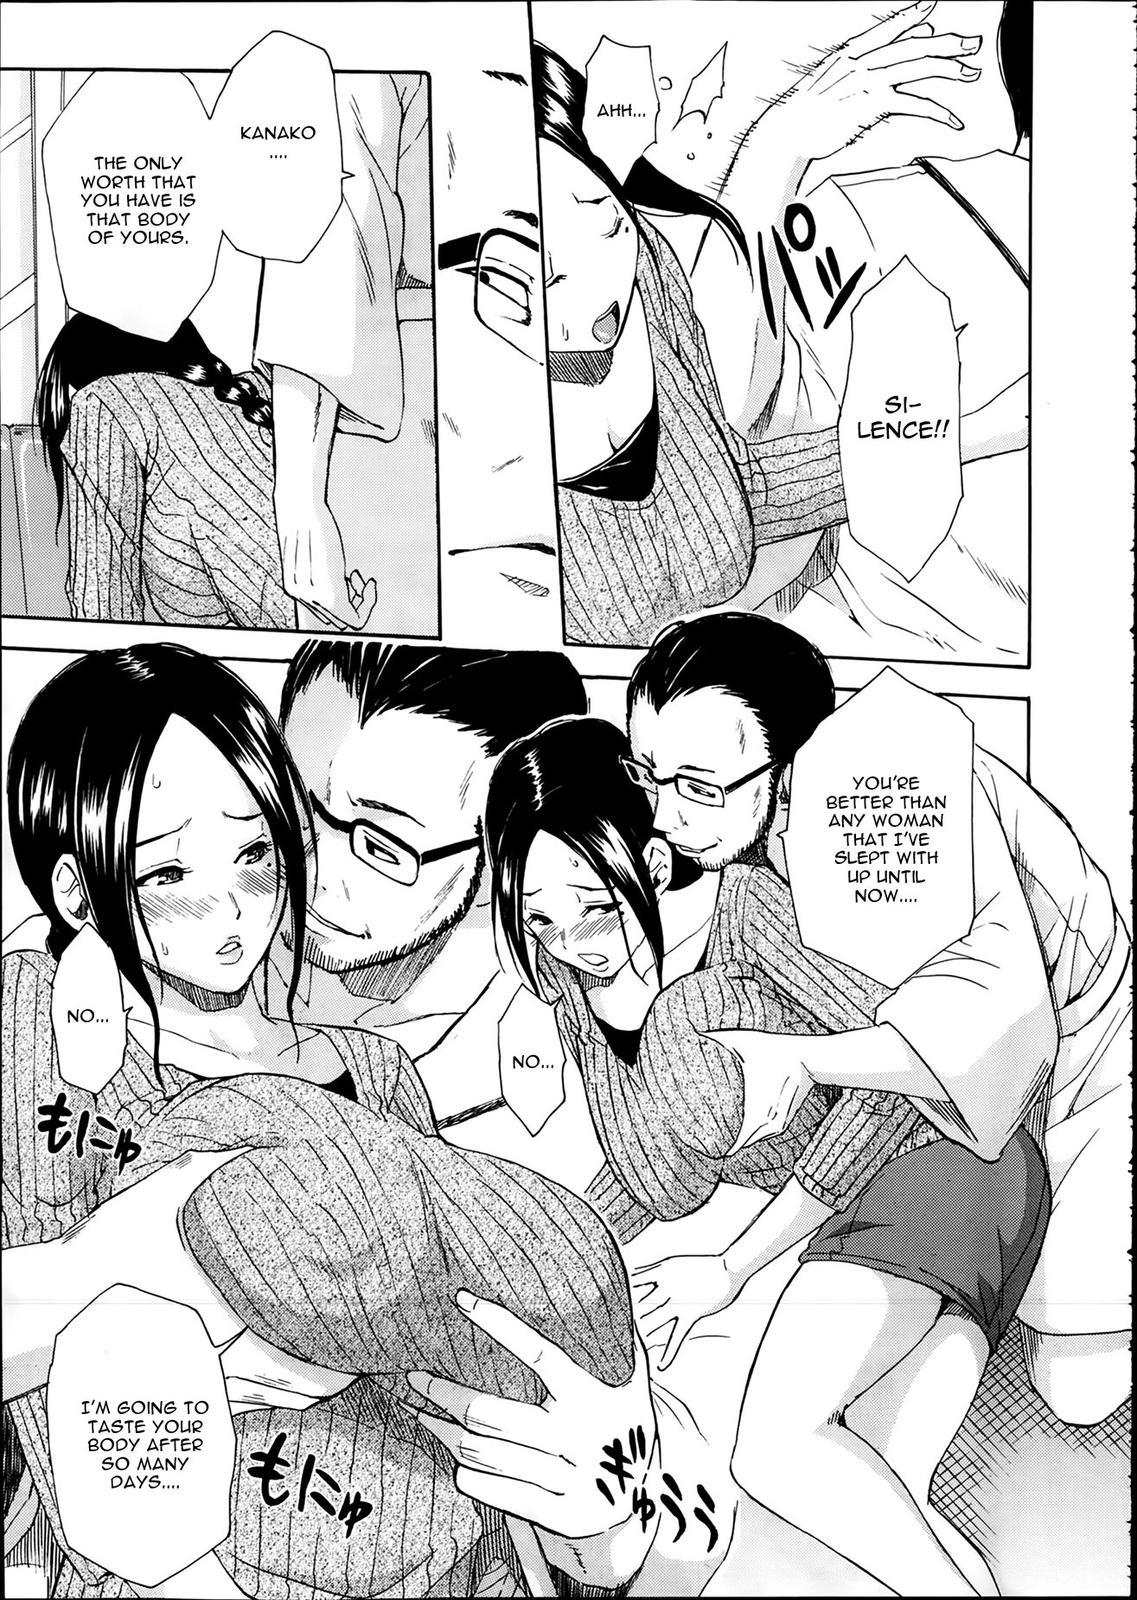 [Chiyou Yoyuchi] Rinkan Gakuen ~Haibokusha-tachi wa Midaremau~   Gang Rape School: The Losers Dance Indecently [English] 69